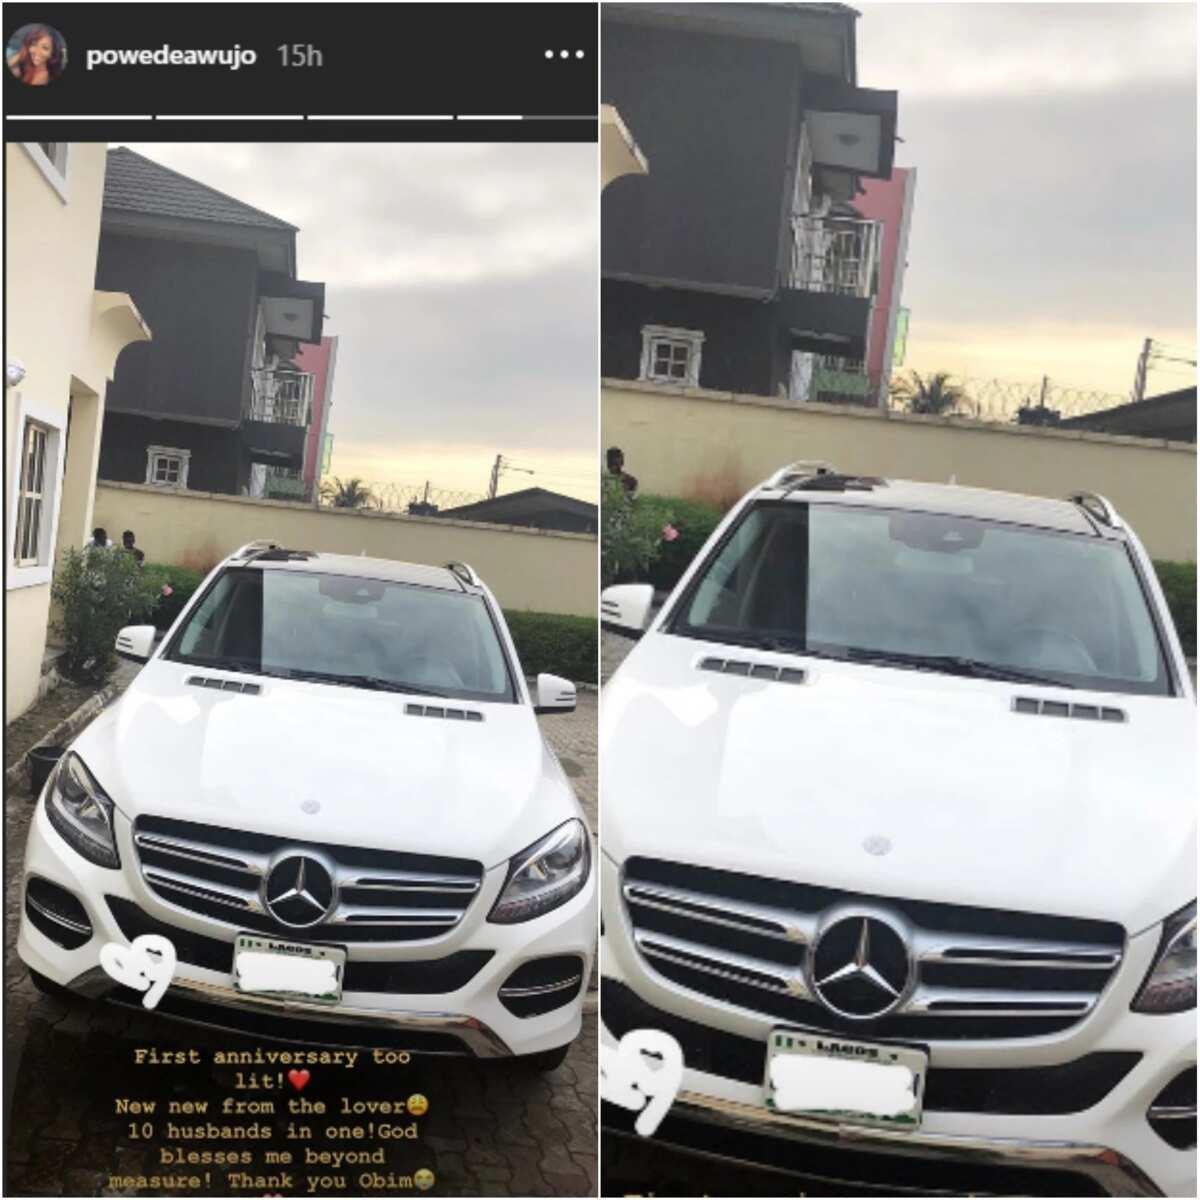 Ex-beauty queen Powede gets SUV